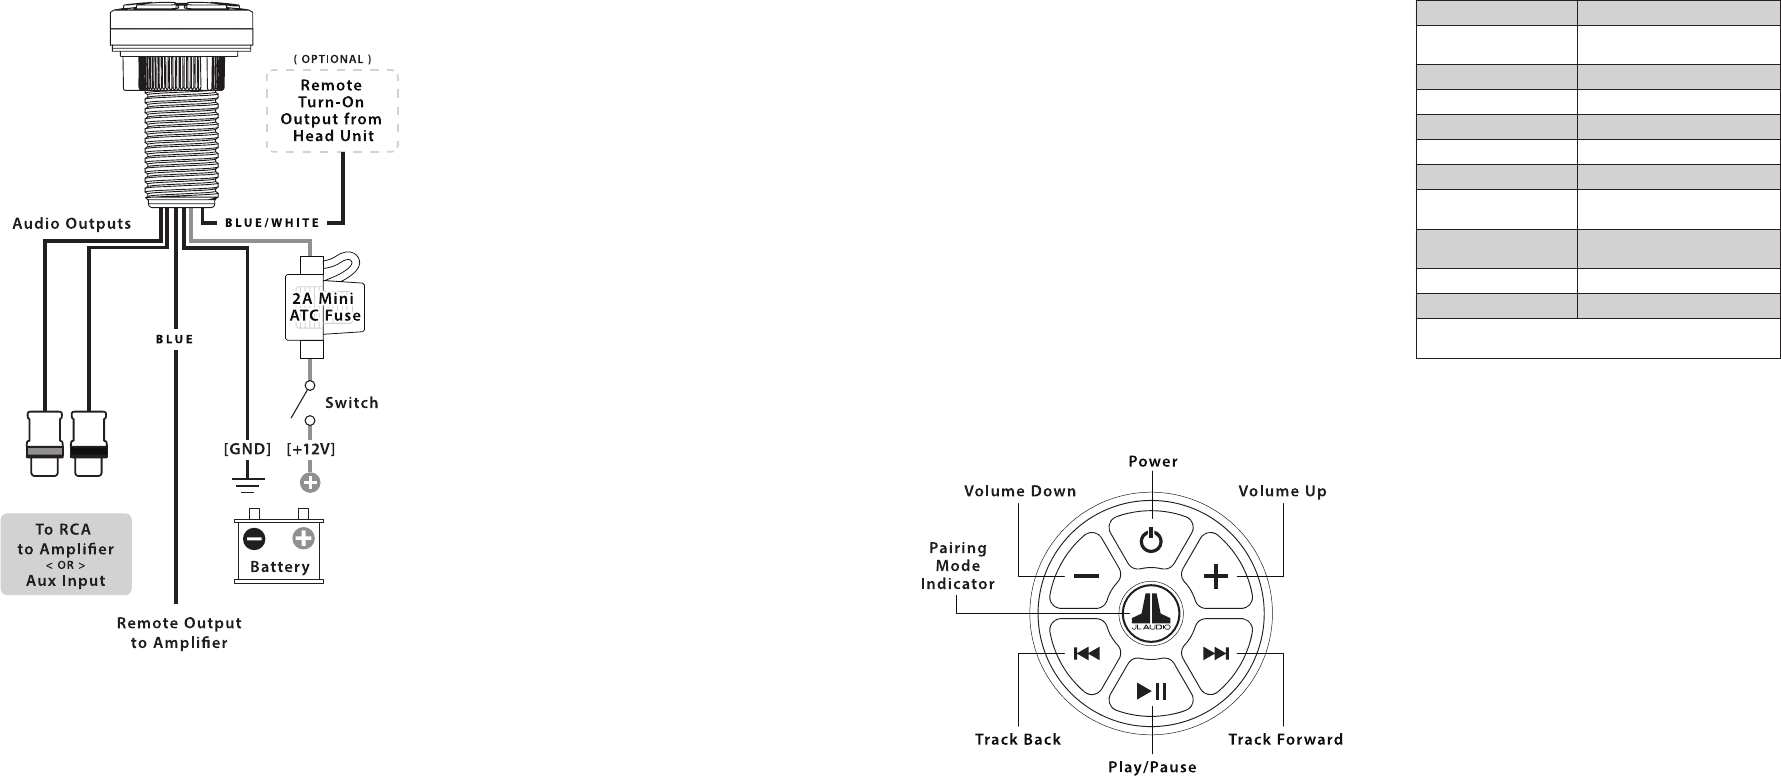 JL Audio MBT-CRX Bluetooth Audio Receiver User Manual UserMan on apple wiring diagram, car stereo system wiring diagram, jl w7 wiring diagram, definitive technology wiring diagram, aiwa wiring diagram, visonik wiring diagram, toshiba wiring diagram, cerwin vega wiring diagram, audio control wiring diagram, panasonic wiring diagram, pioneer deh 150mp instalation diagram, kenwood wiring diagram, jl 500 1 diagram, dual voice coil wiring diagram, planet audio wiring diagram, chevy blazer overhead console wiring diagram, lanzar wiring diagram, clifford wiring diagram, polk audio wiring diagram, onstar fmv wiring diagram,